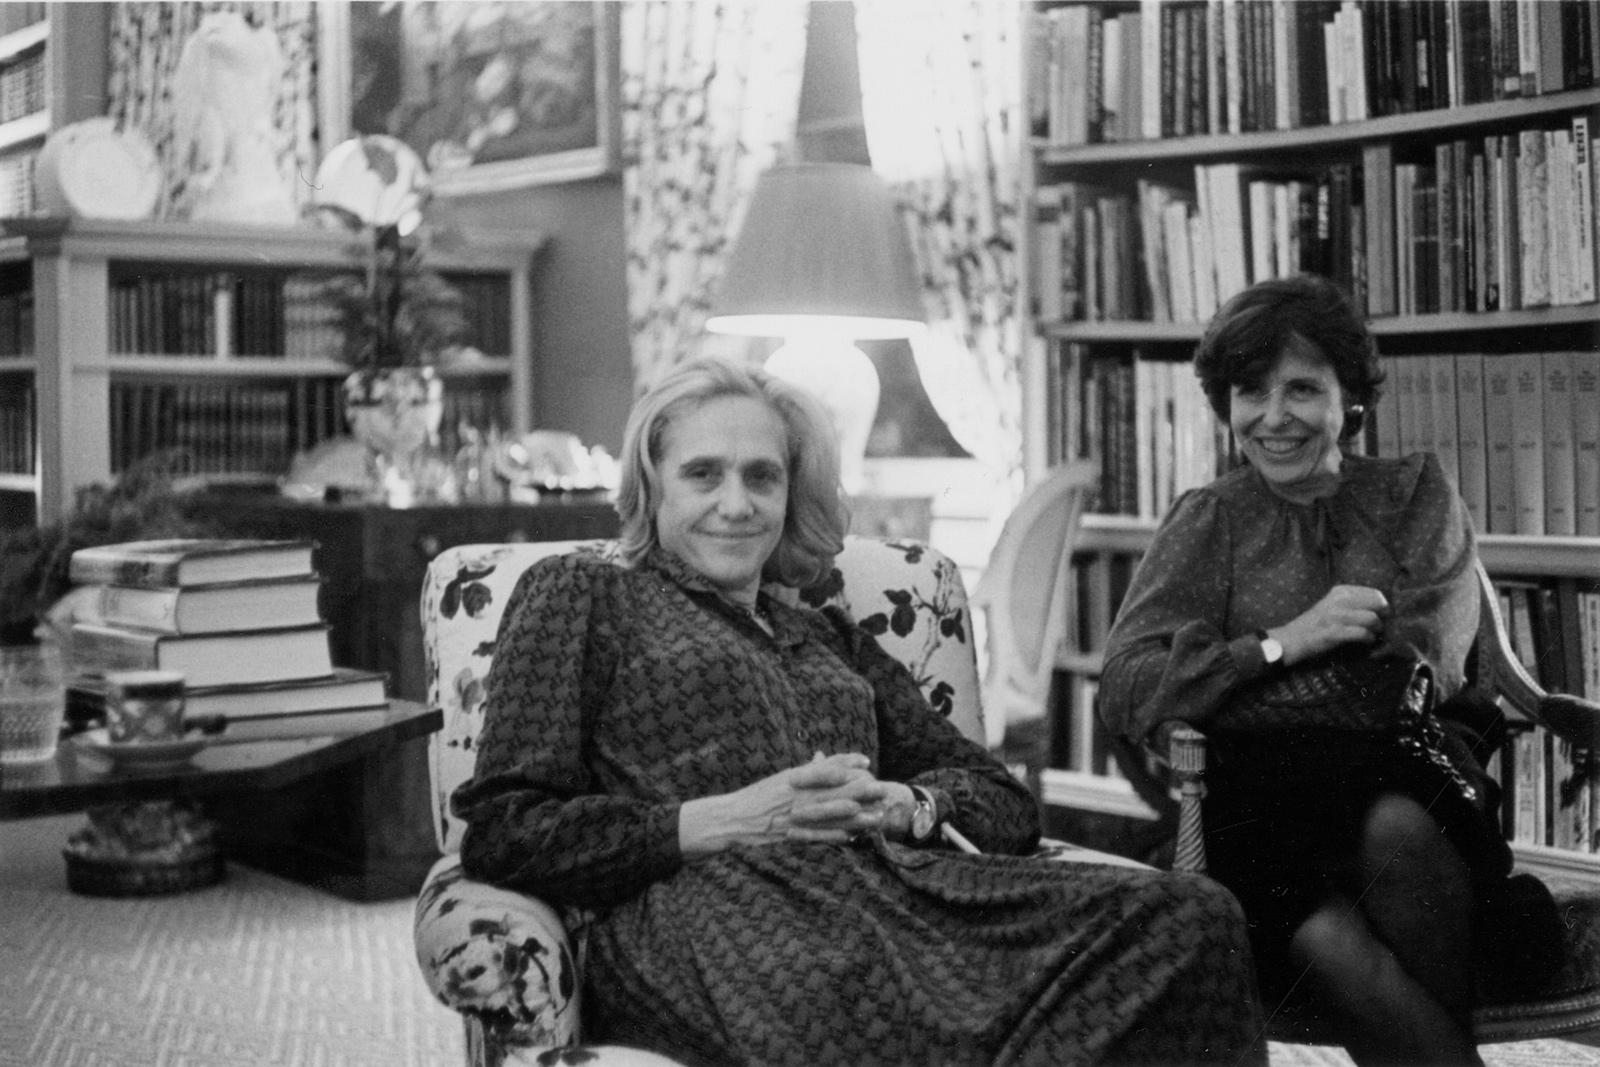 Natasha Spender and New York Review editor Barbara Epstein